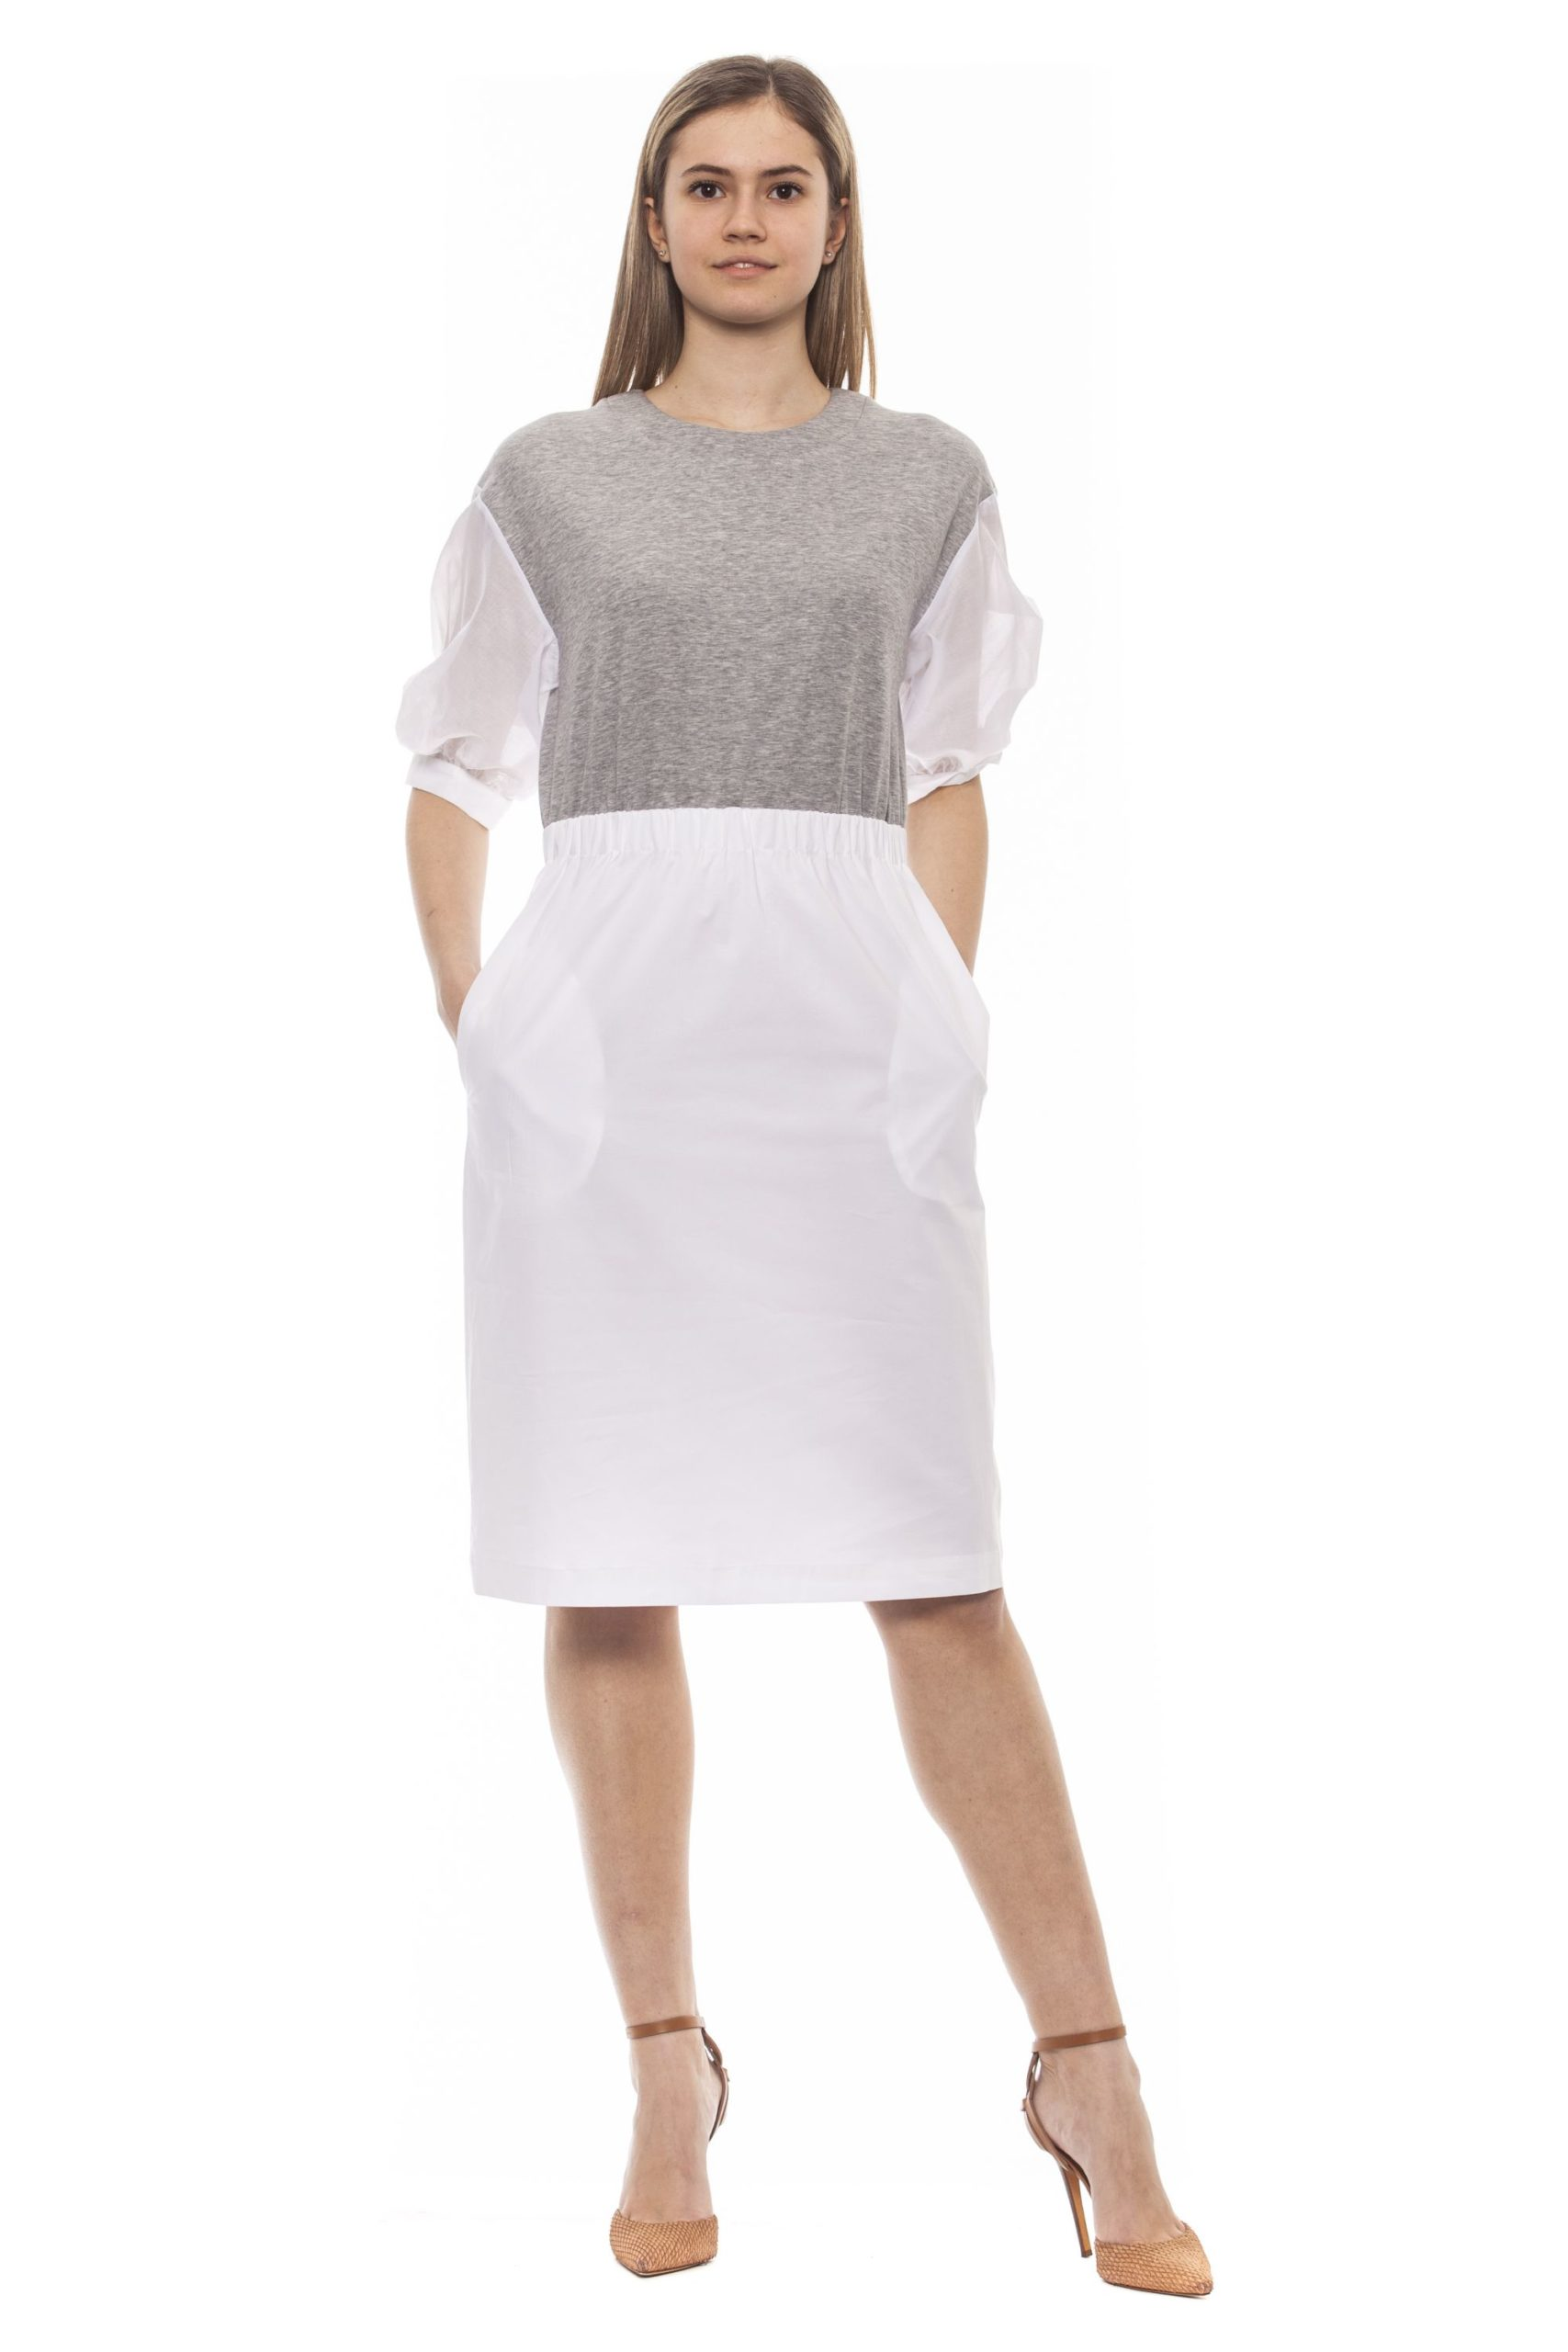 Peserico Women's Grigio Dress Gray PE1383200 - IT42 | S